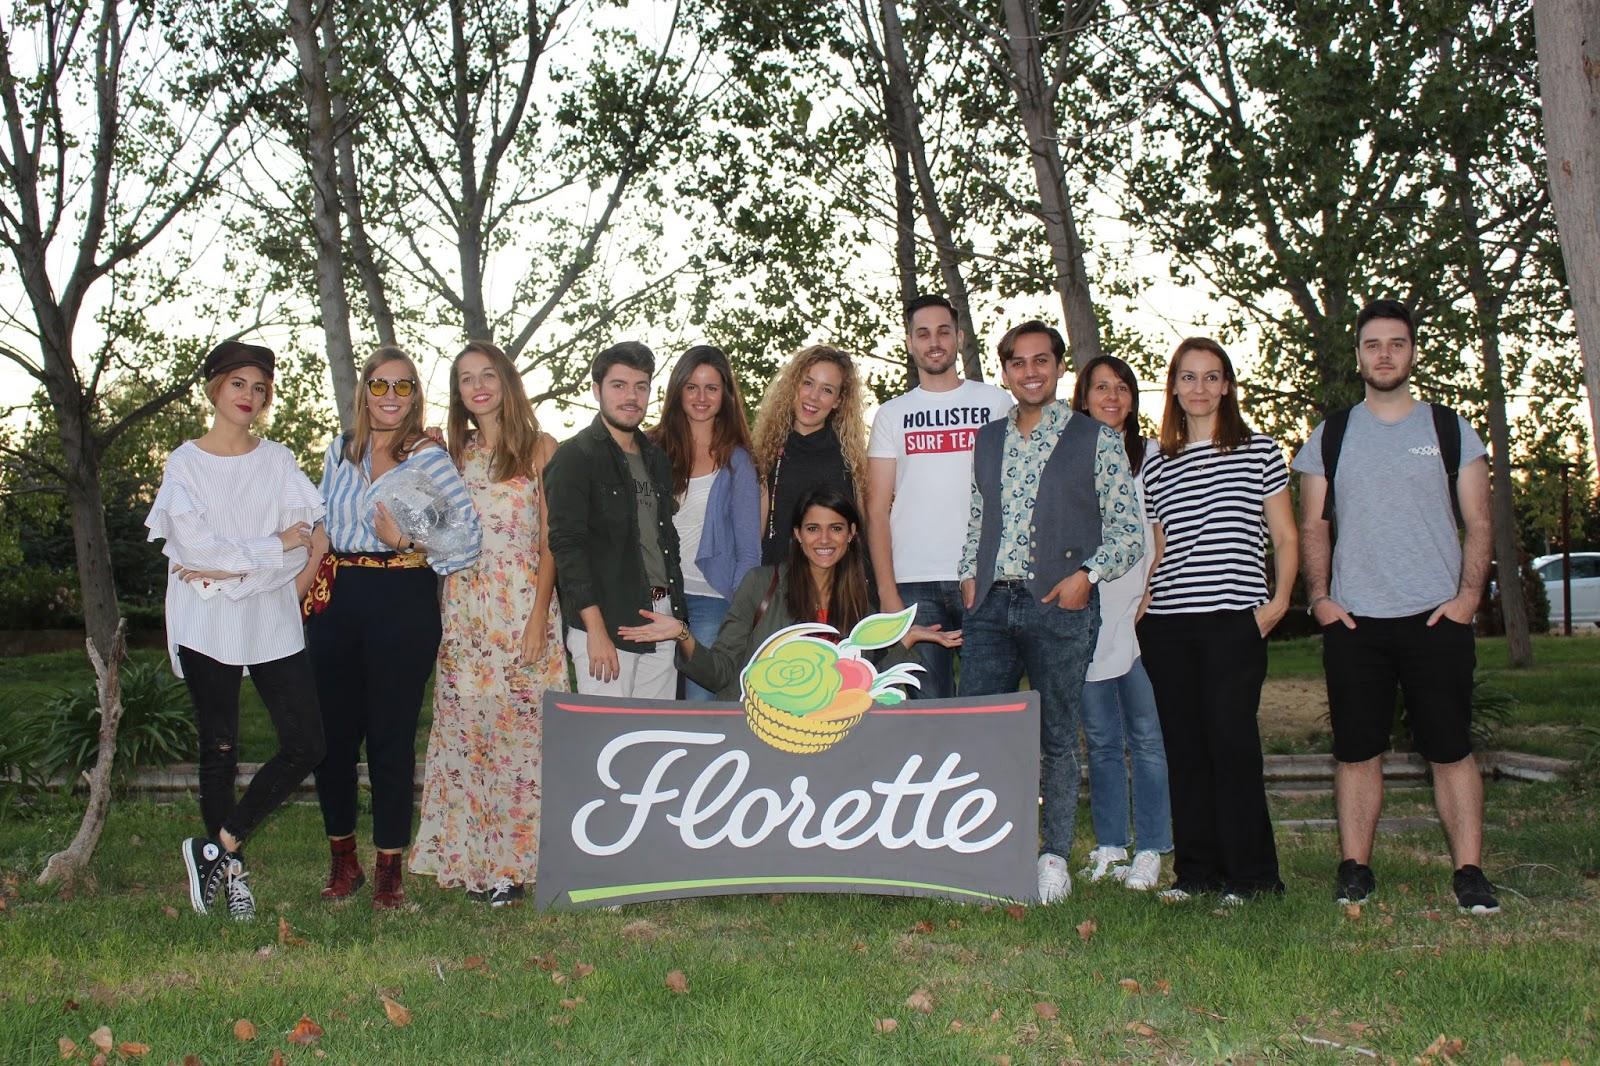 Viaje al corazón de Florette